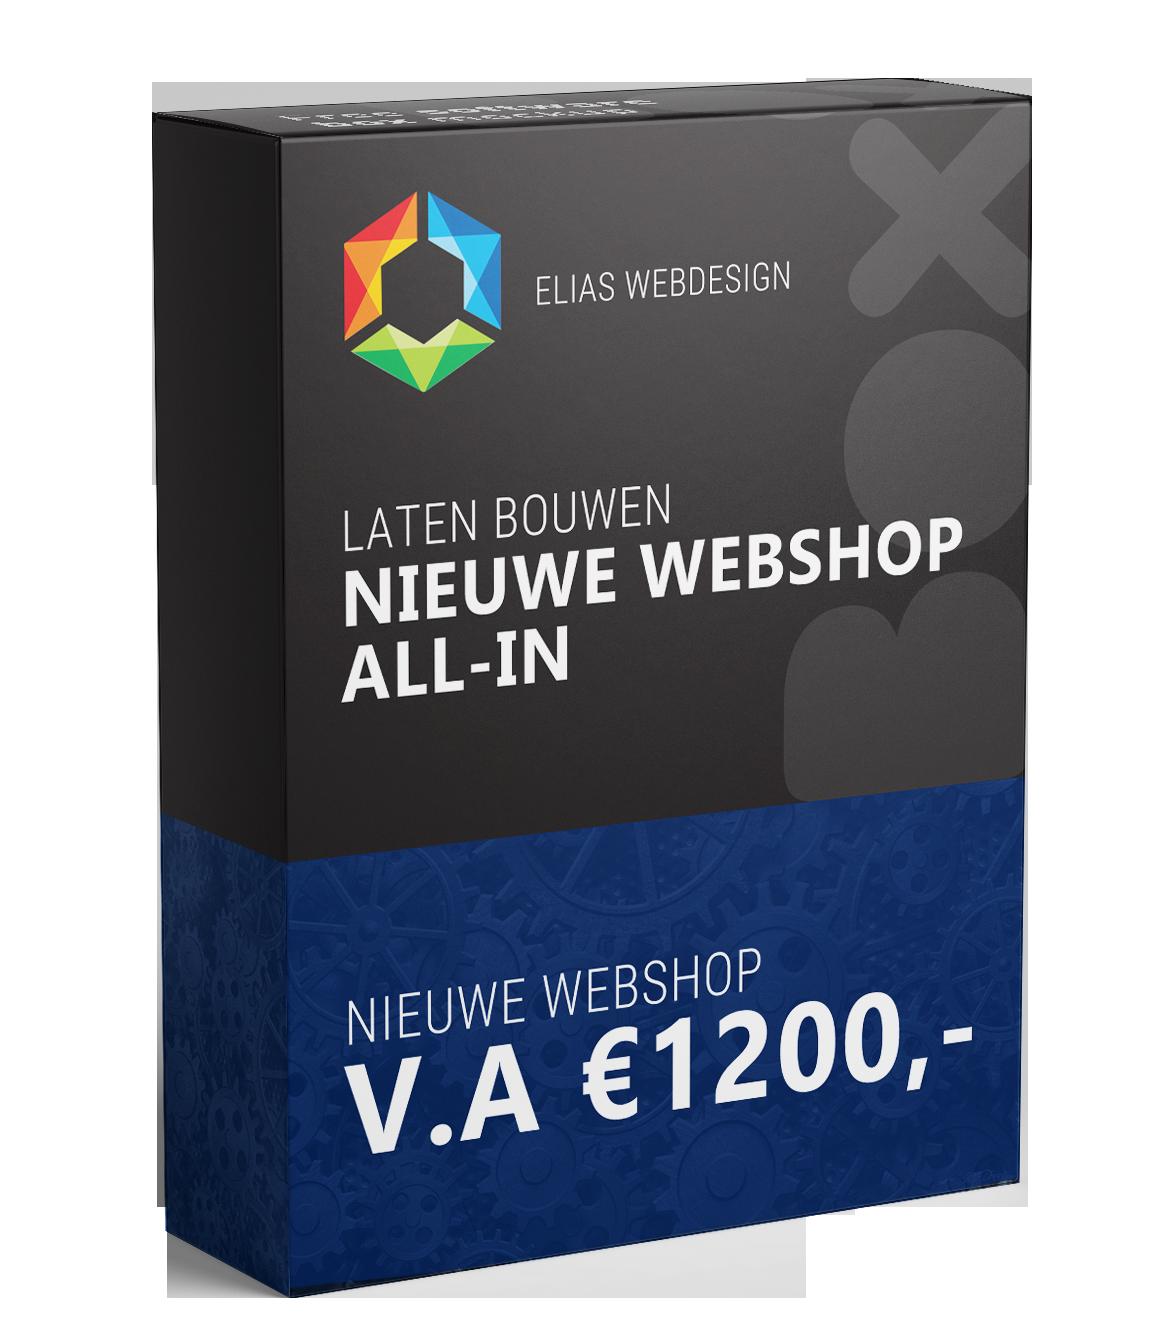 Nieuwe webshop laten bouwen Elias Webdesign